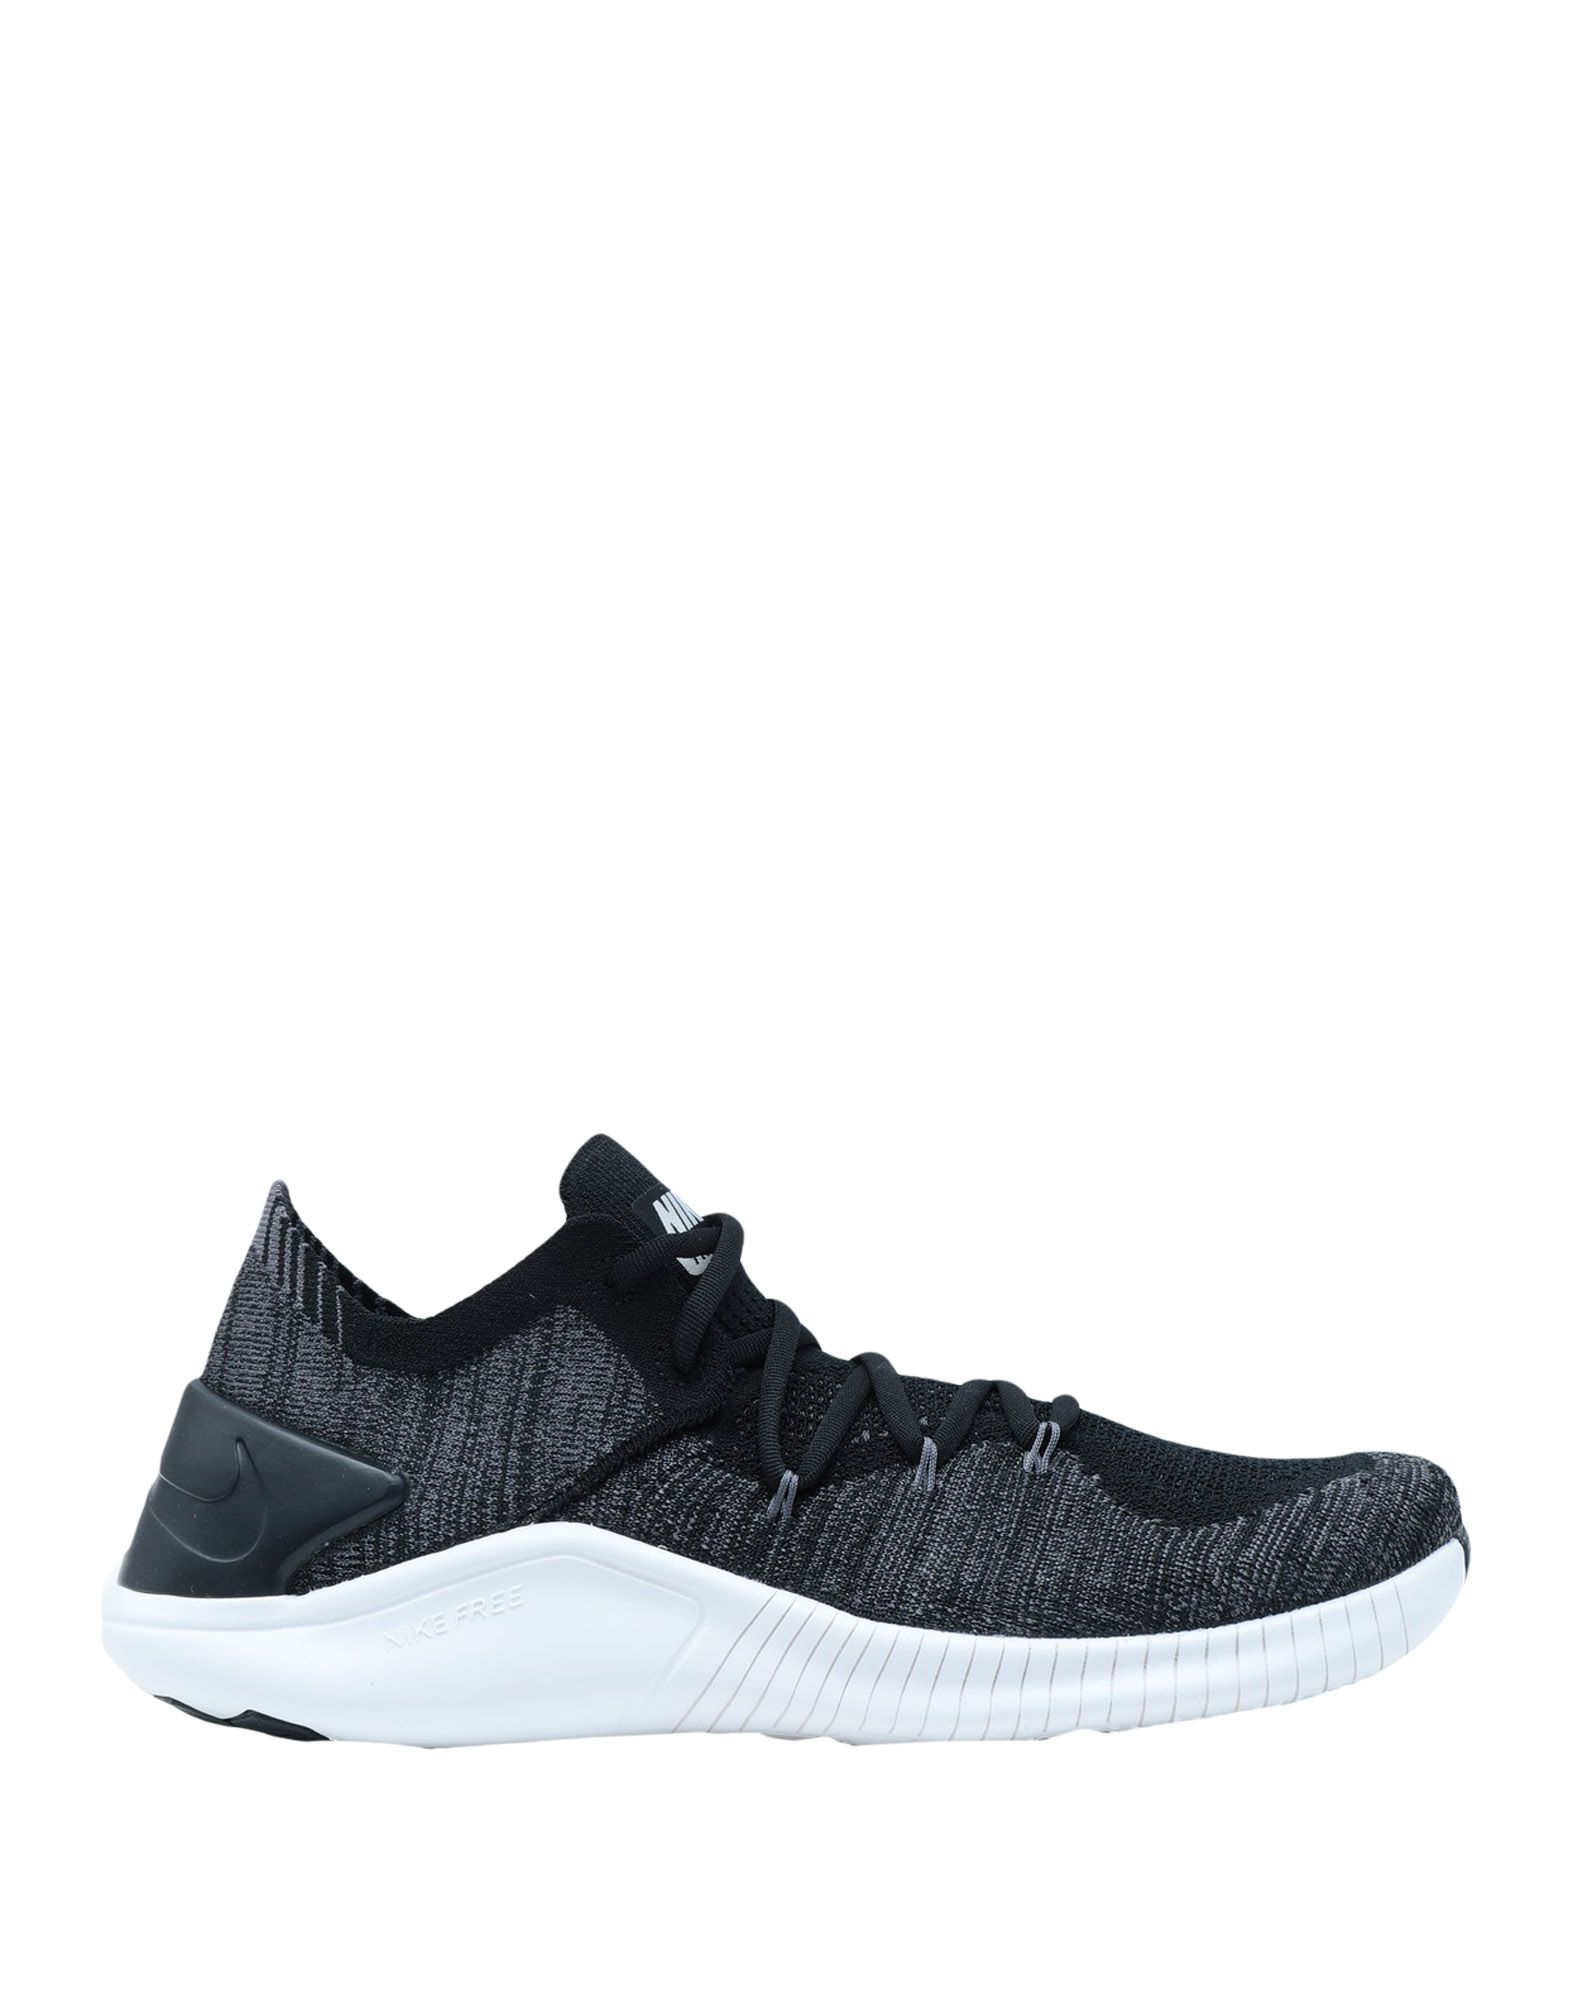 Turnschuhe Nike Free Tr Flyknit 3 - damen - 11652531WF